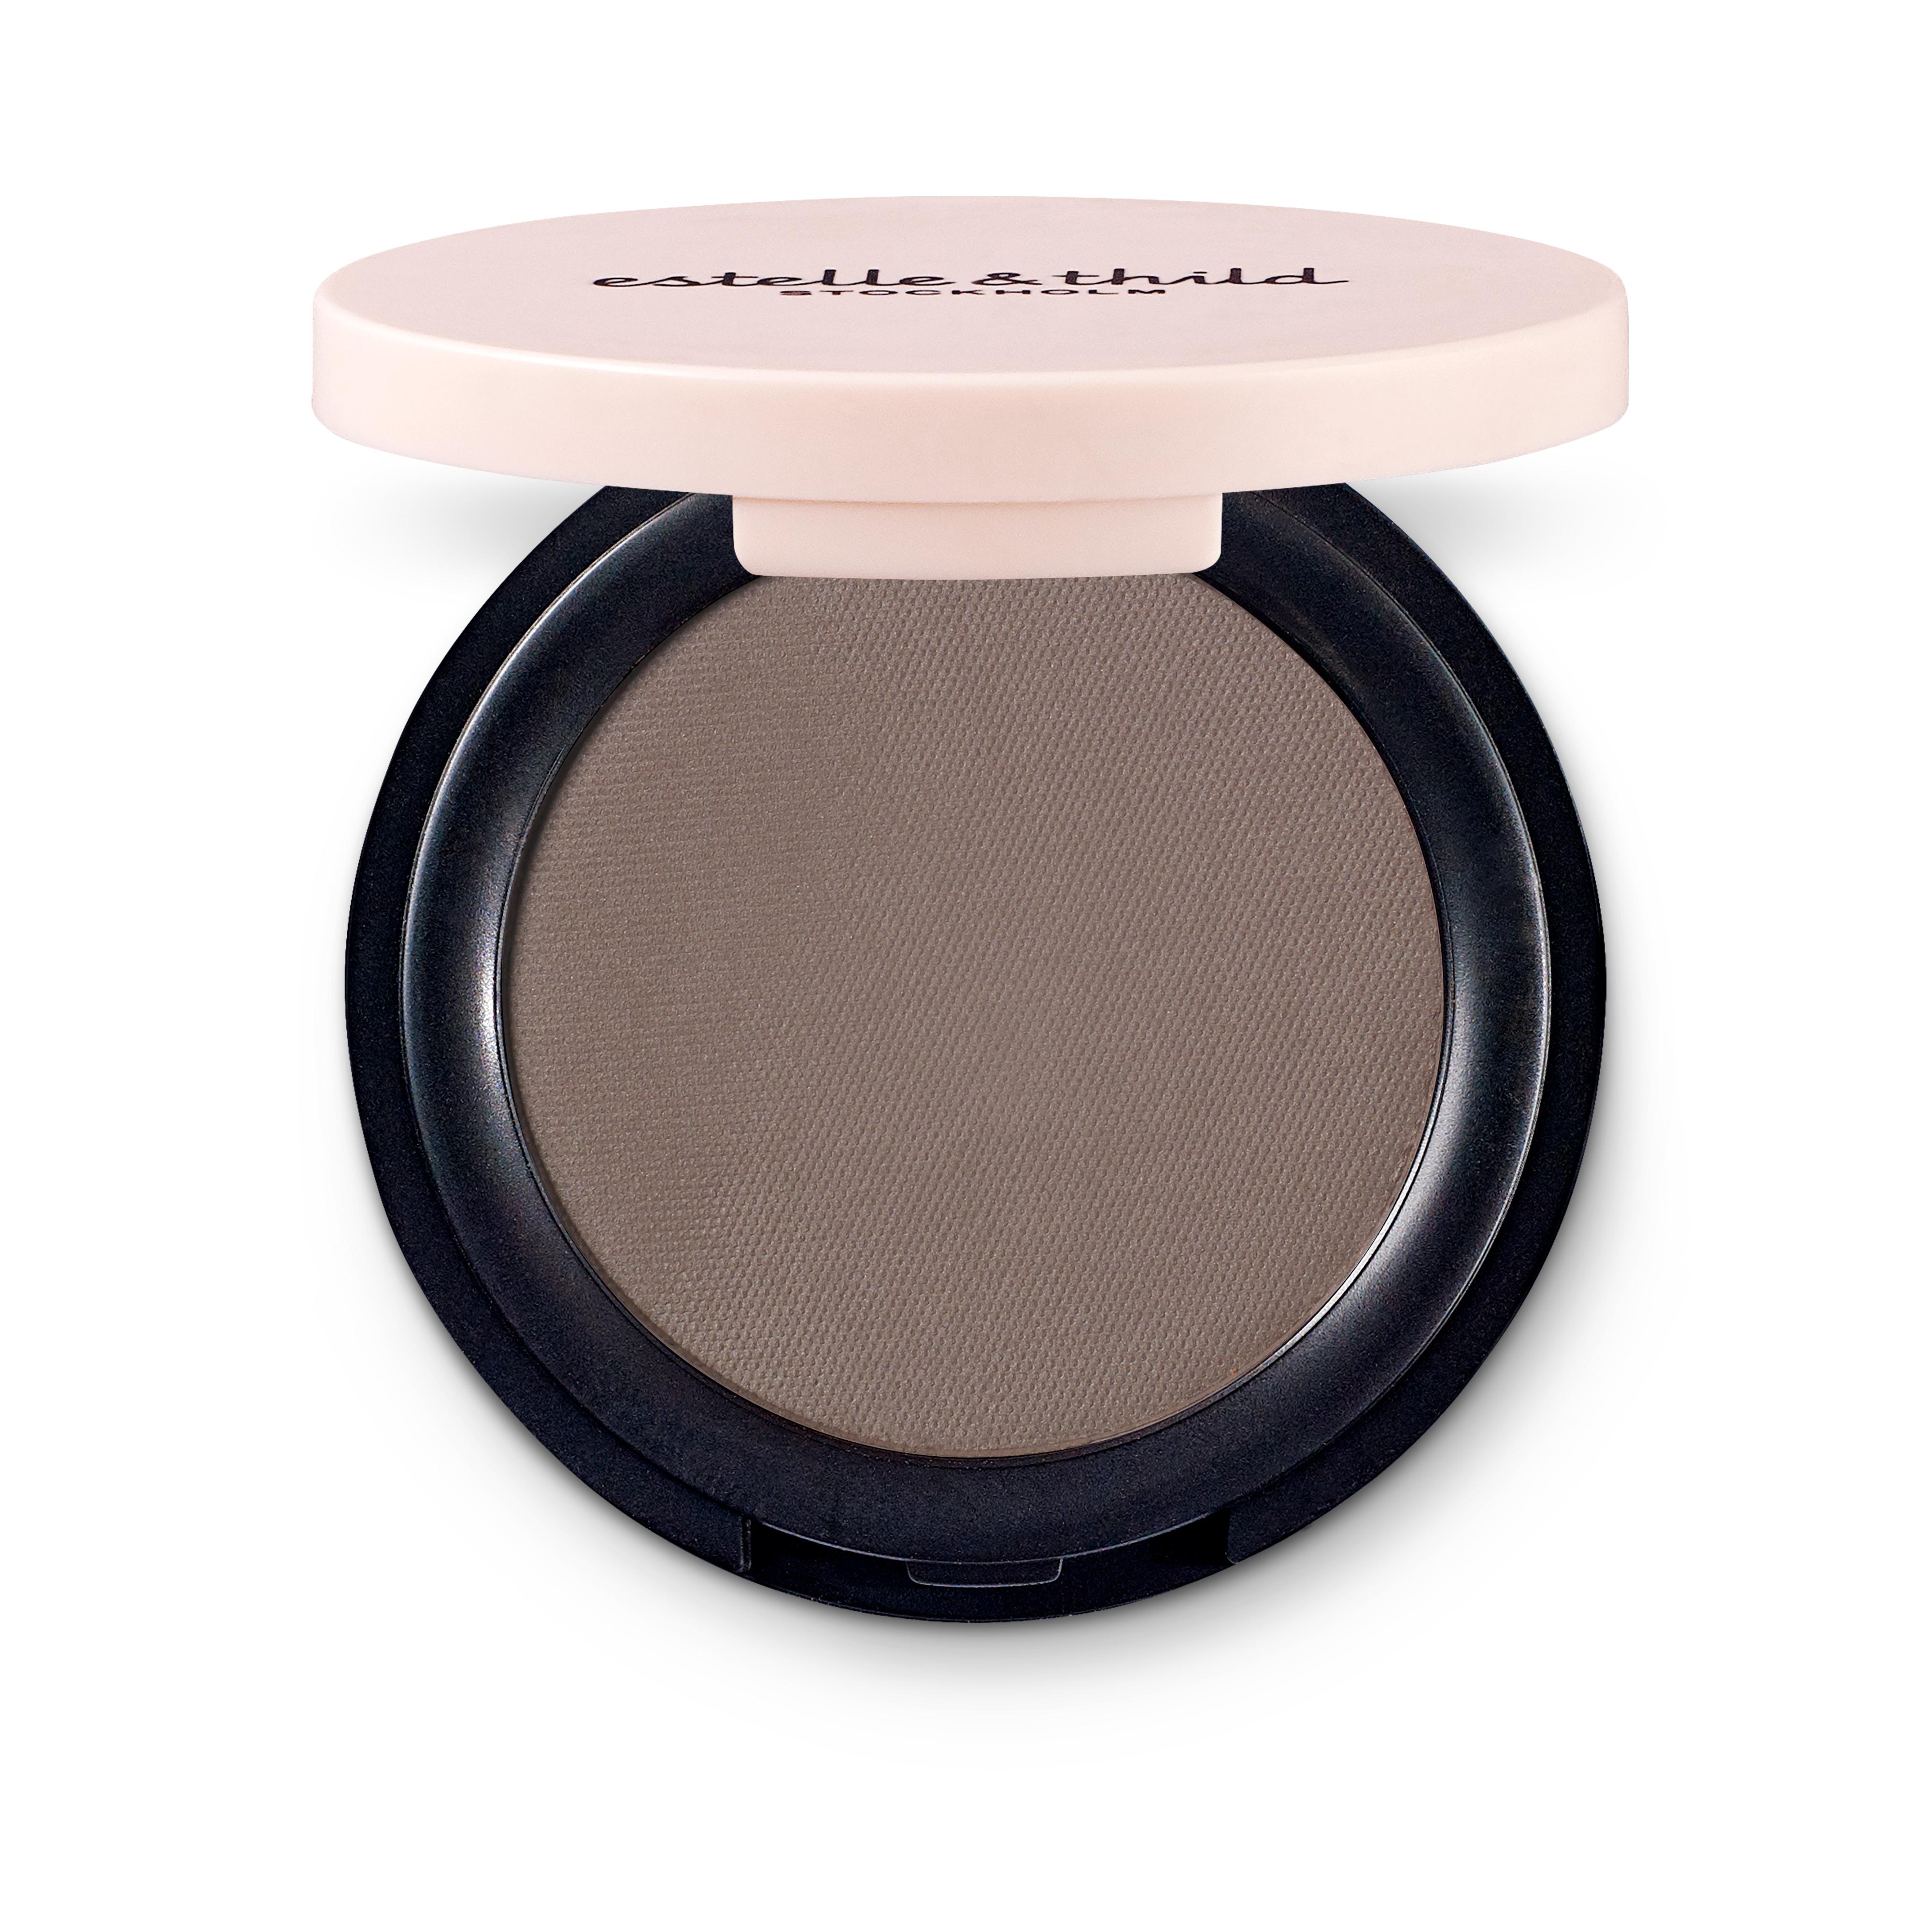 BioMineral Silky Eyeshadow Cold brown